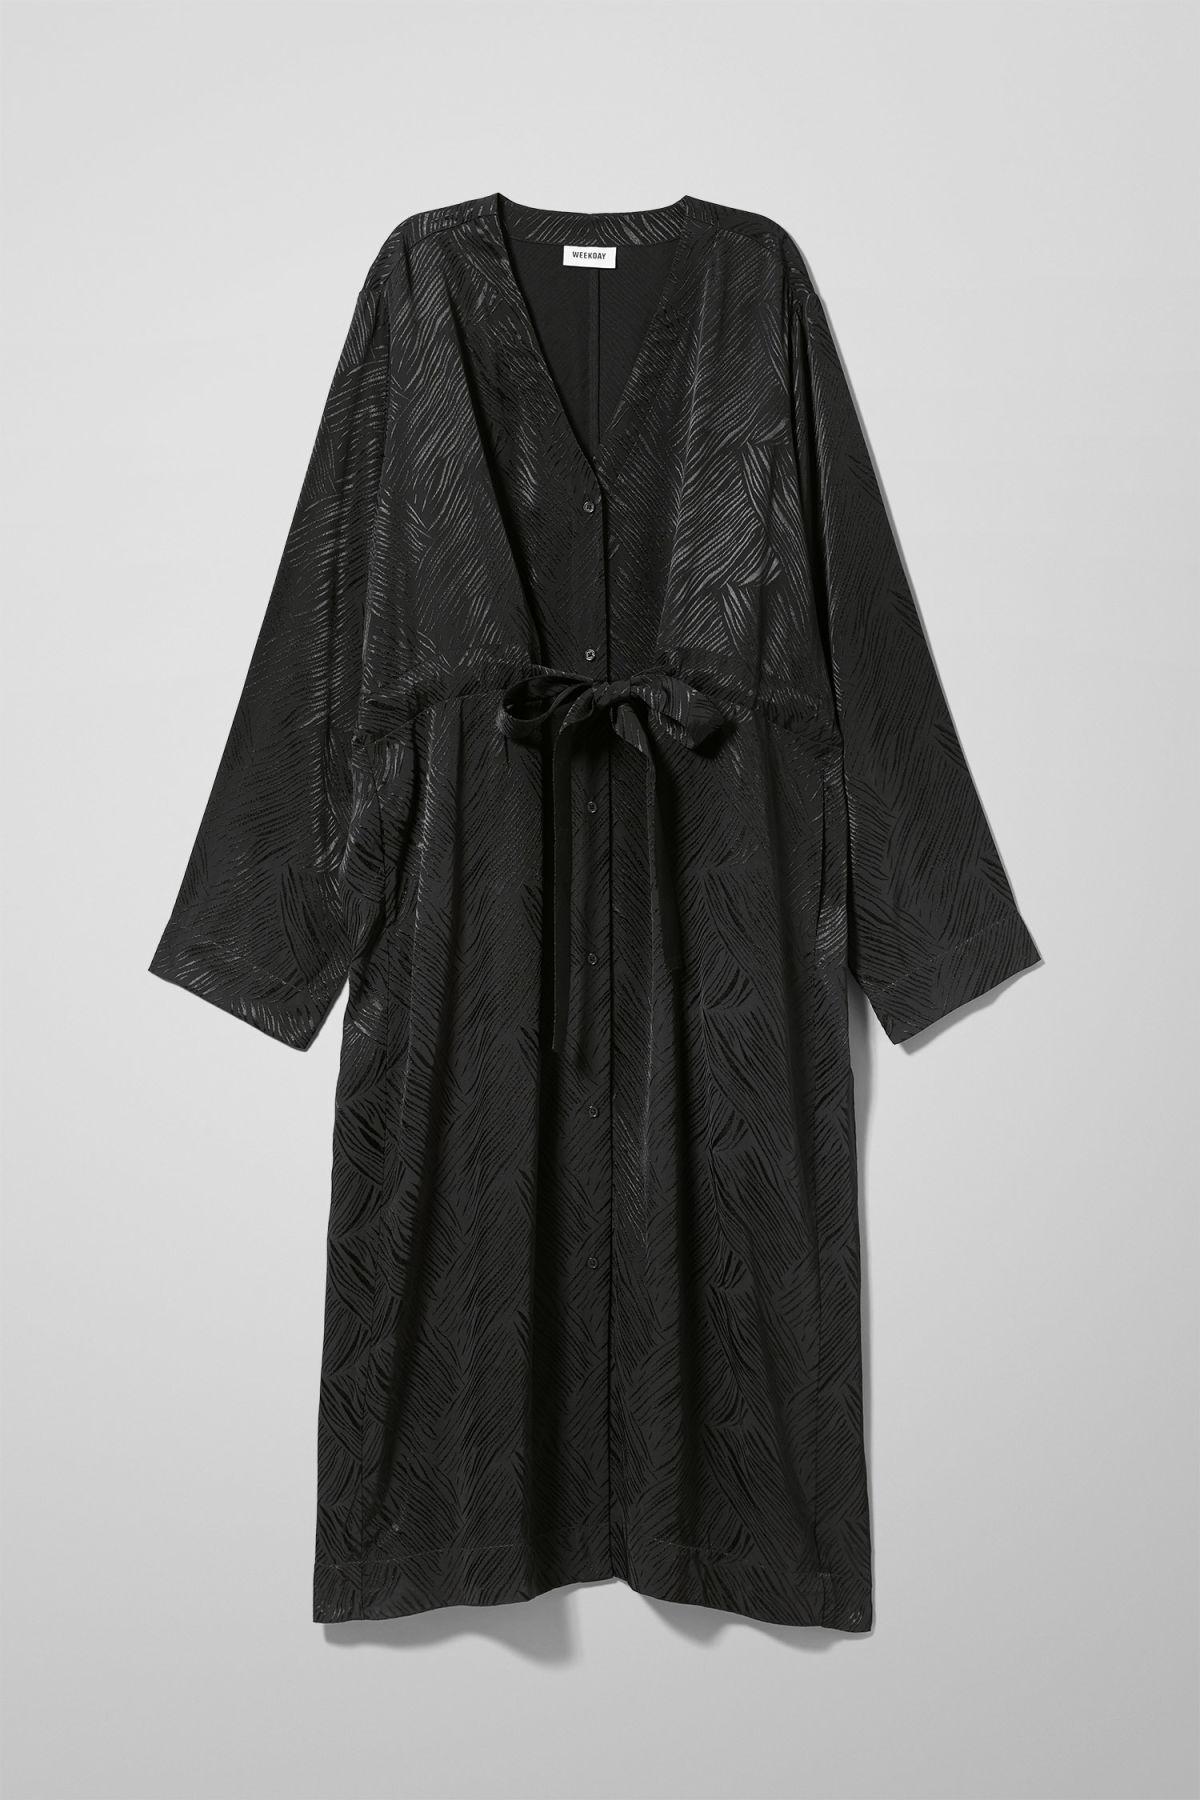 Image of Chalk Long Sleeve Dress - Black-M